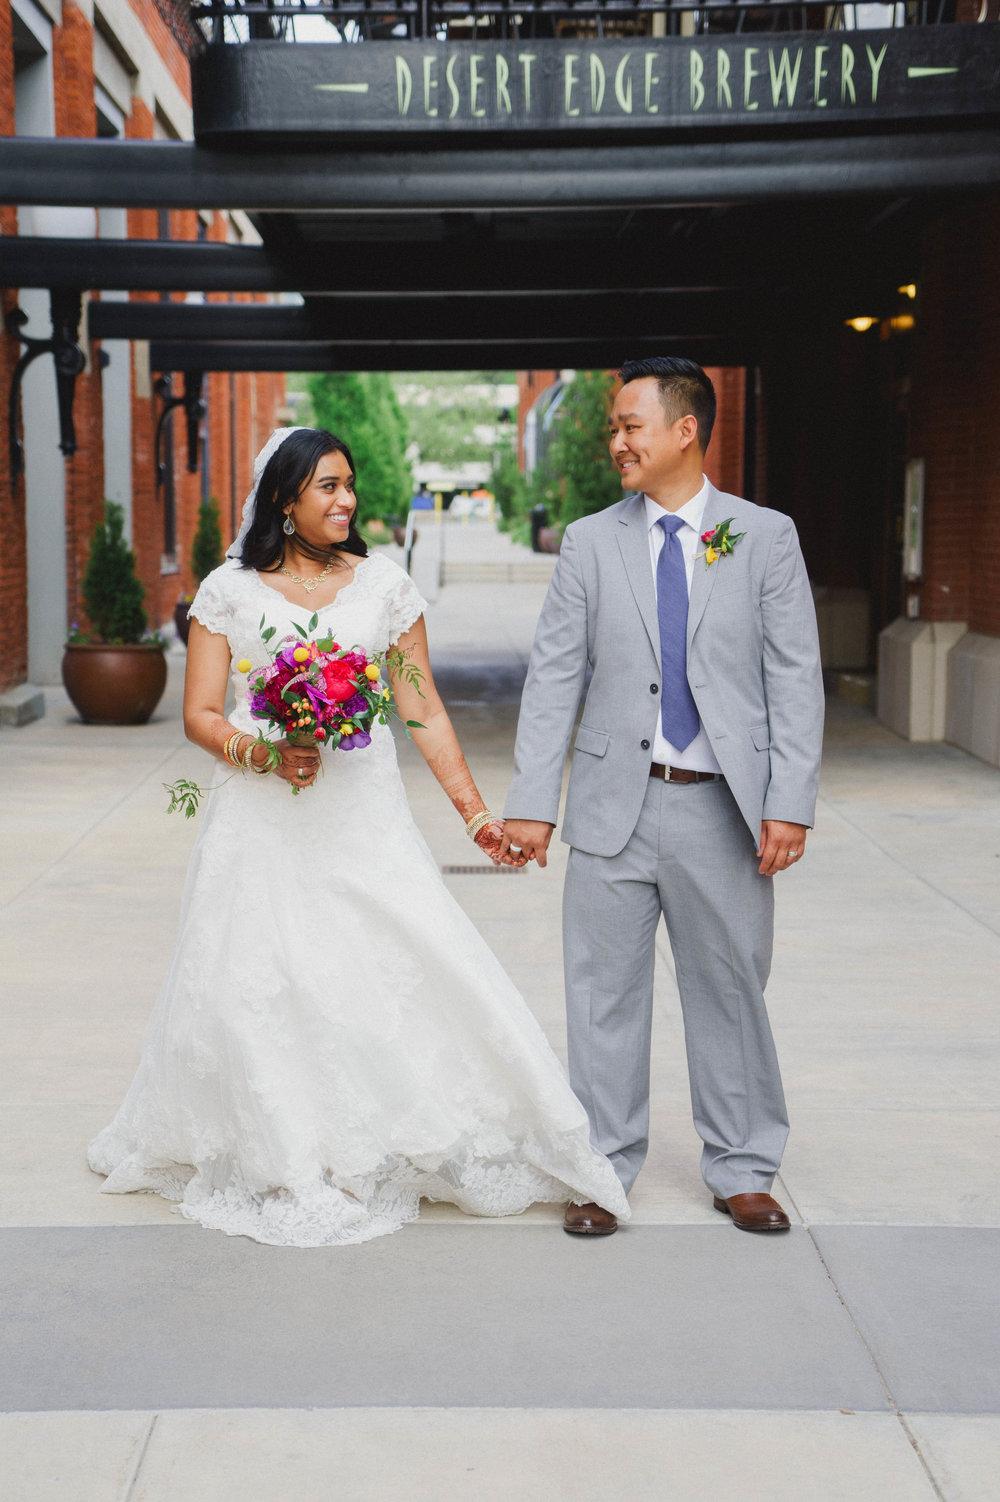 RnP+Lim+Wedding+(123)-2.jpg